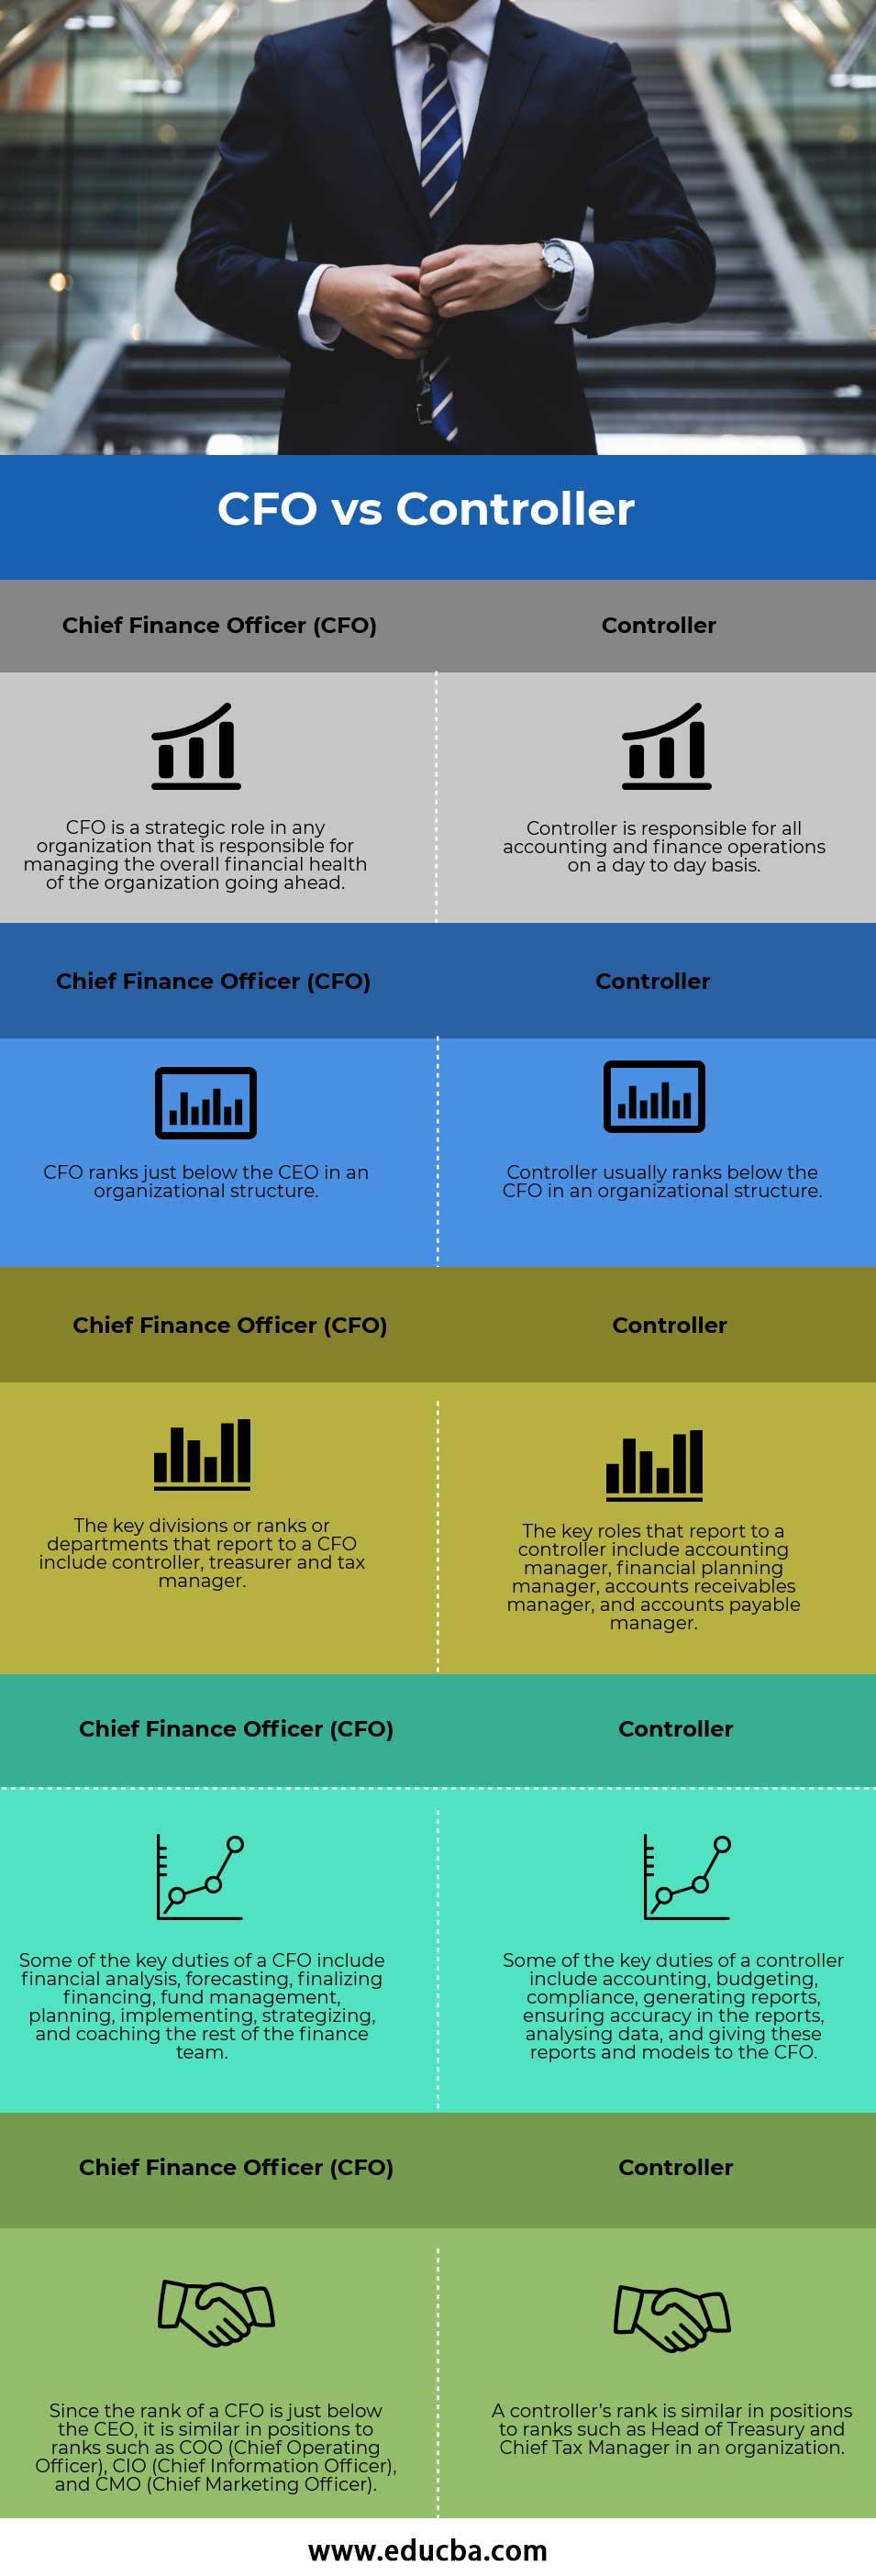 CFO-vs-Controller-info